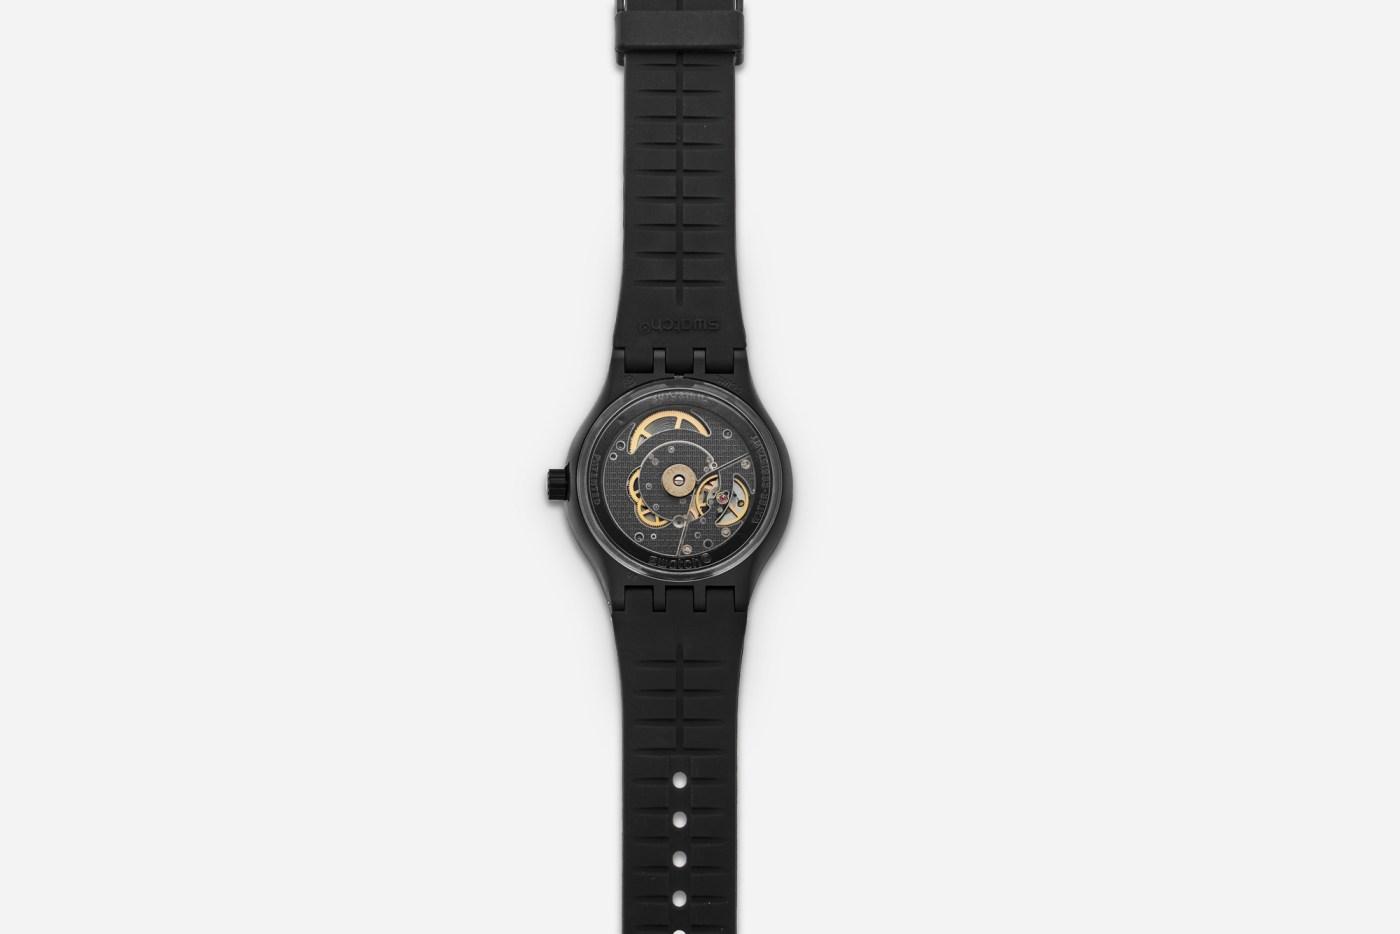 Swatch Sistem51 Hodinkee Generation 1986 caseback